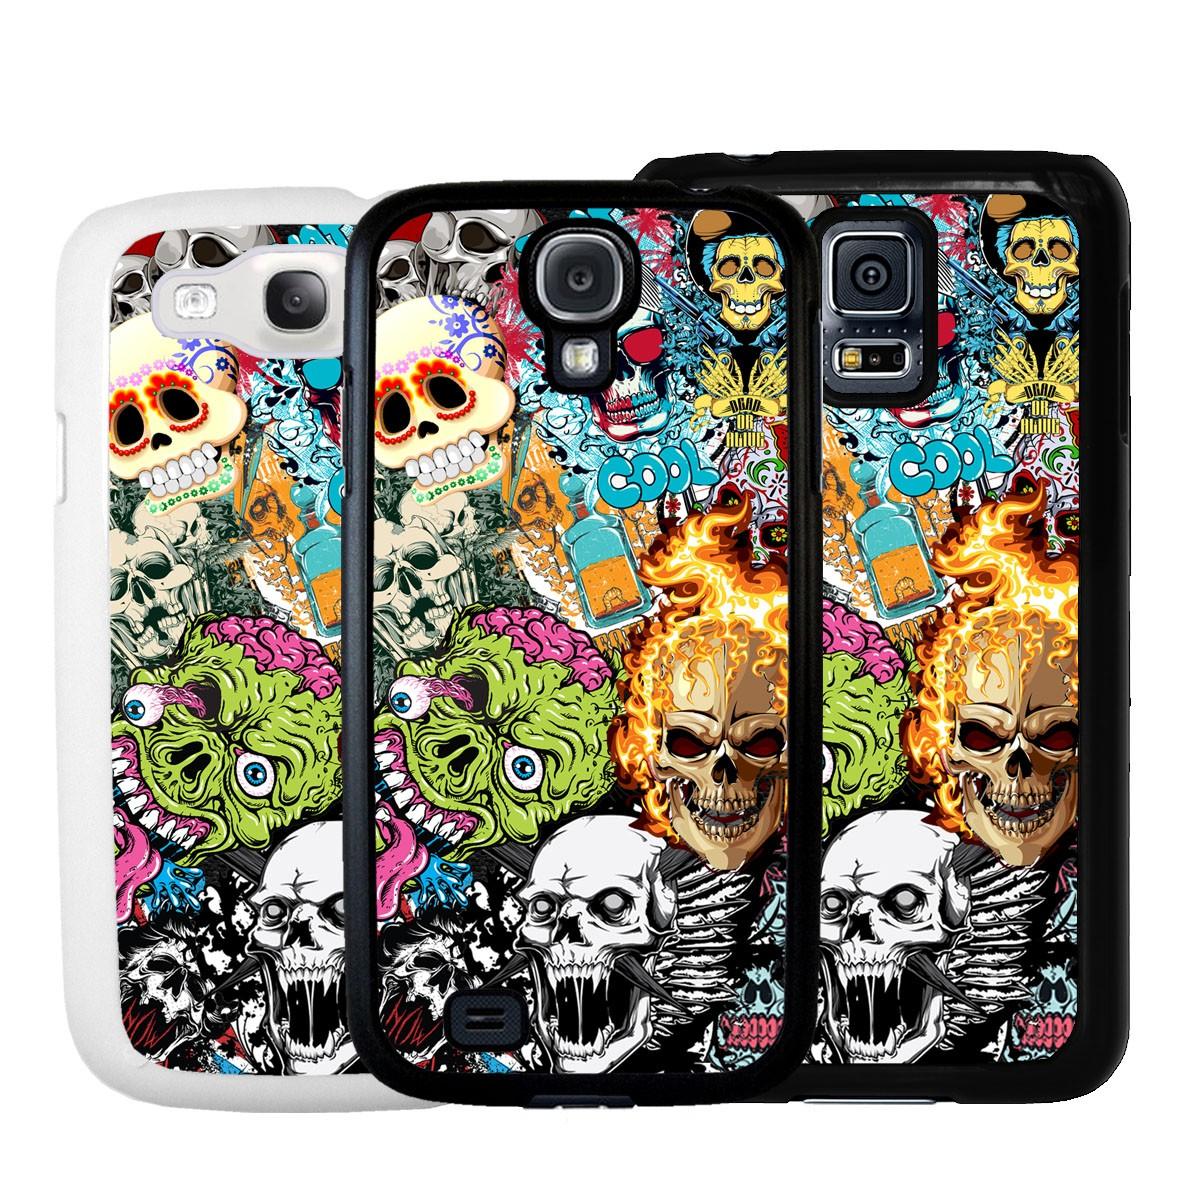 COVER Skulls Teschi StickerBomb Bianco e Nero Apple iPhone 4 5 6